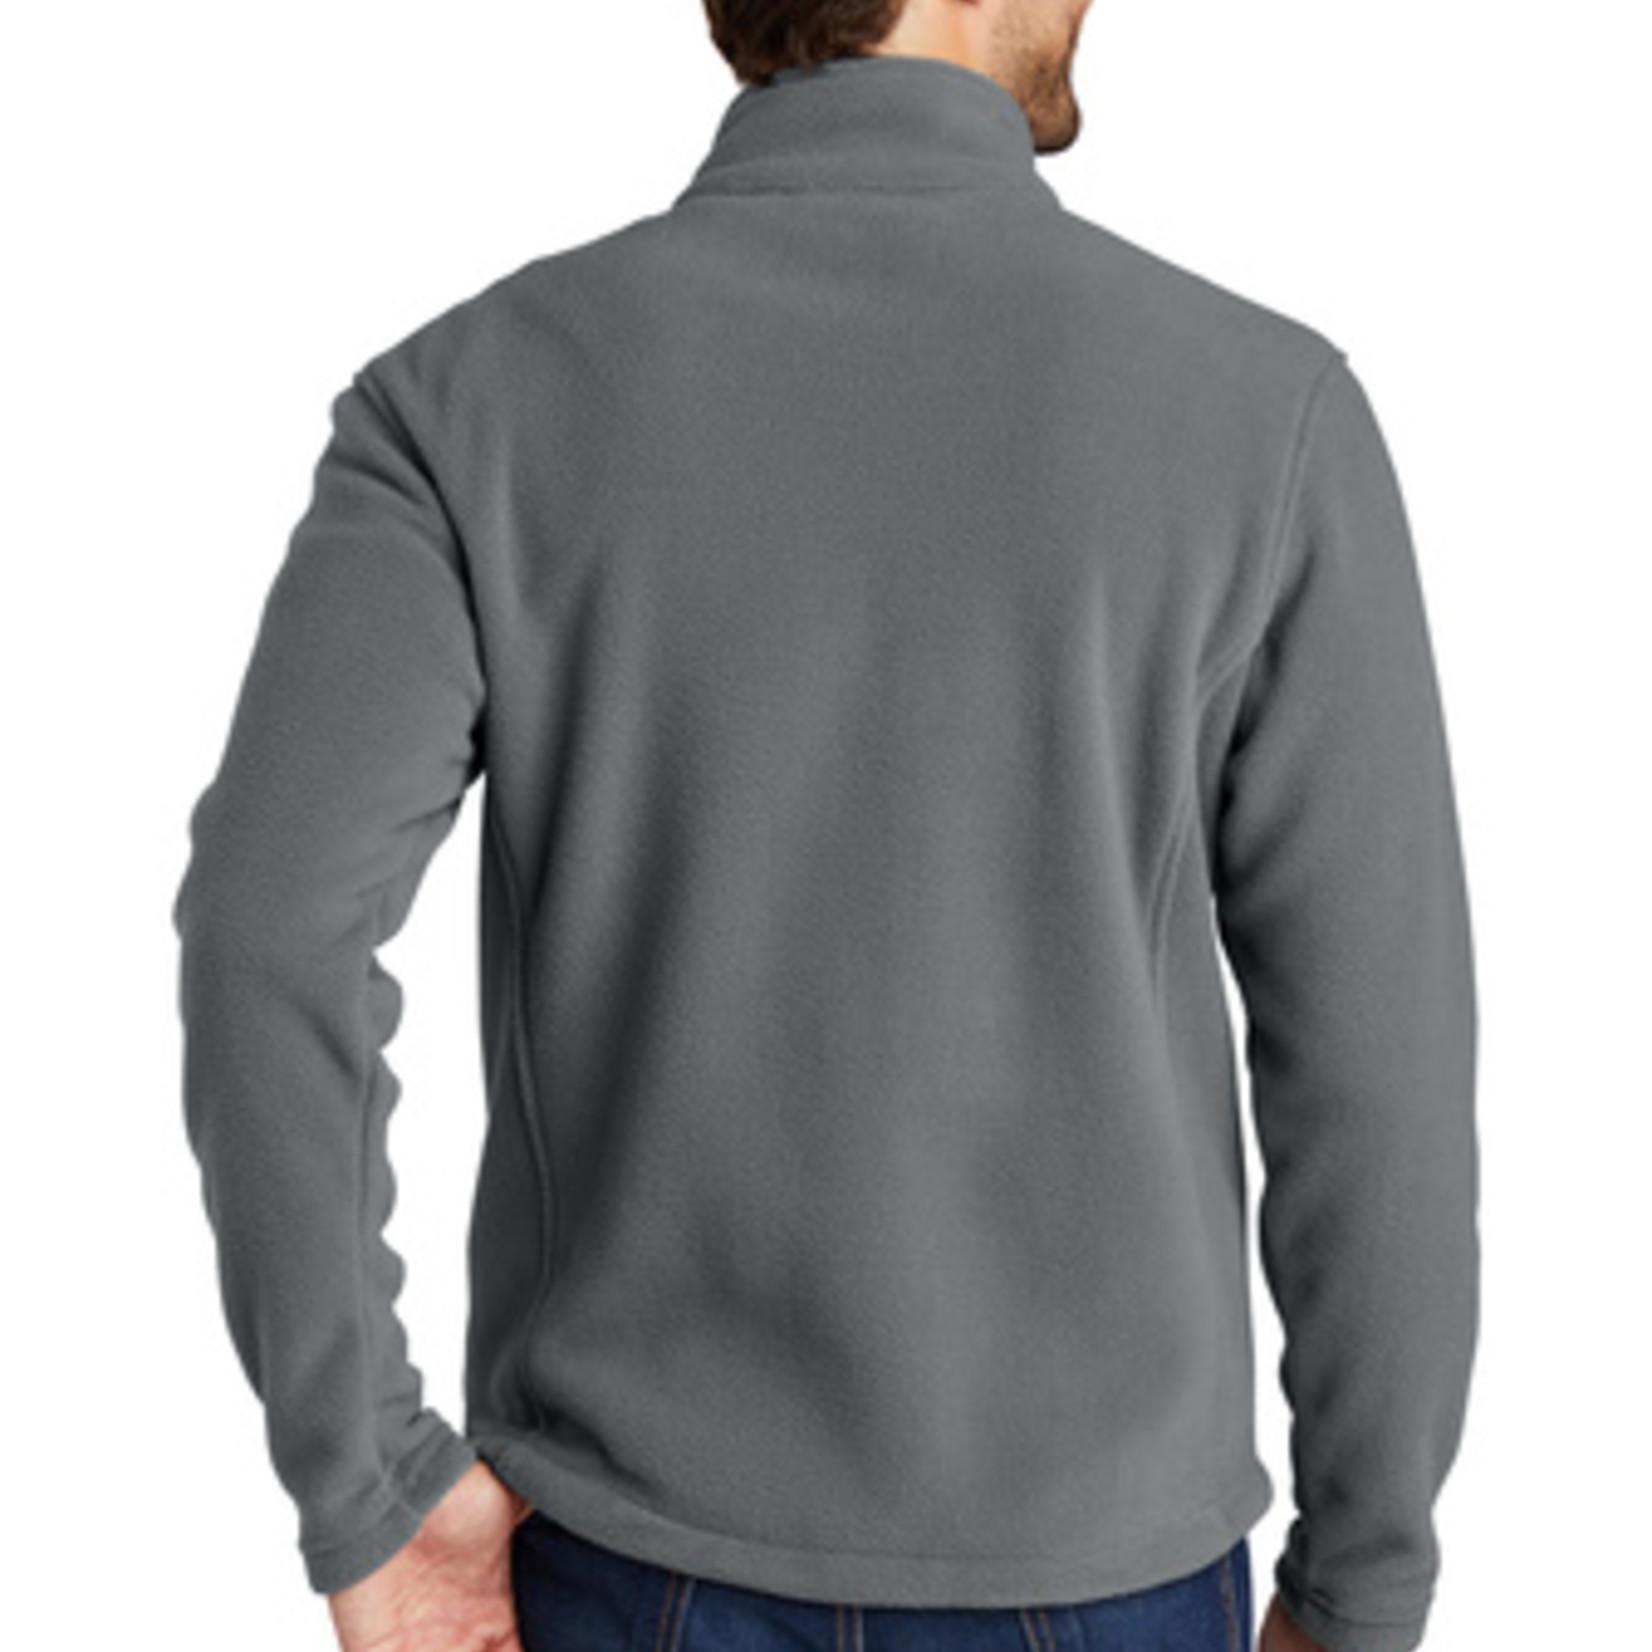 Port Authority Value Fleece Jacket F217